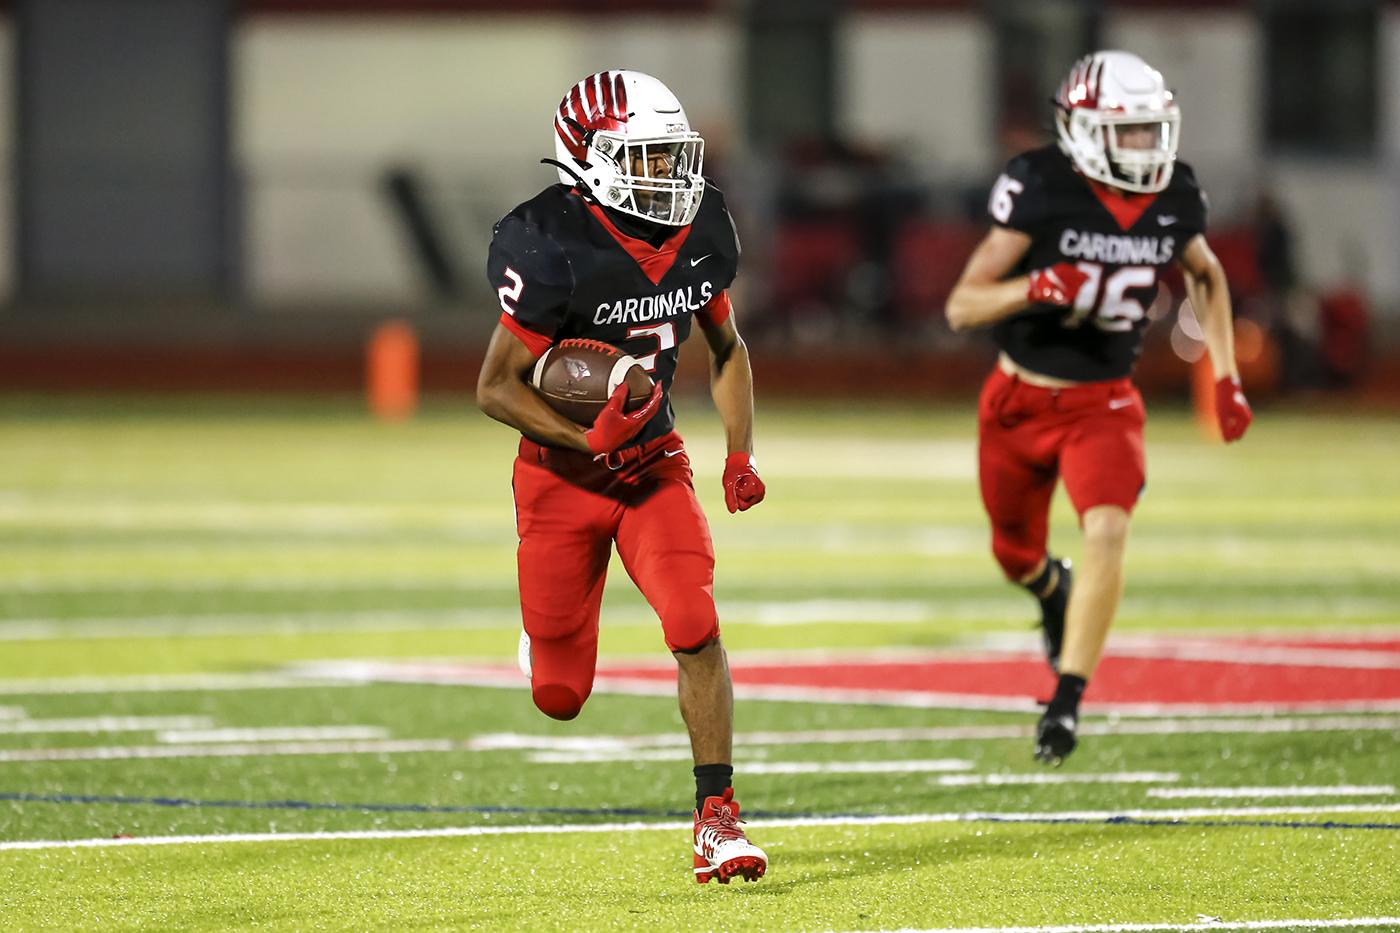 Cardinal football player runs with the ball